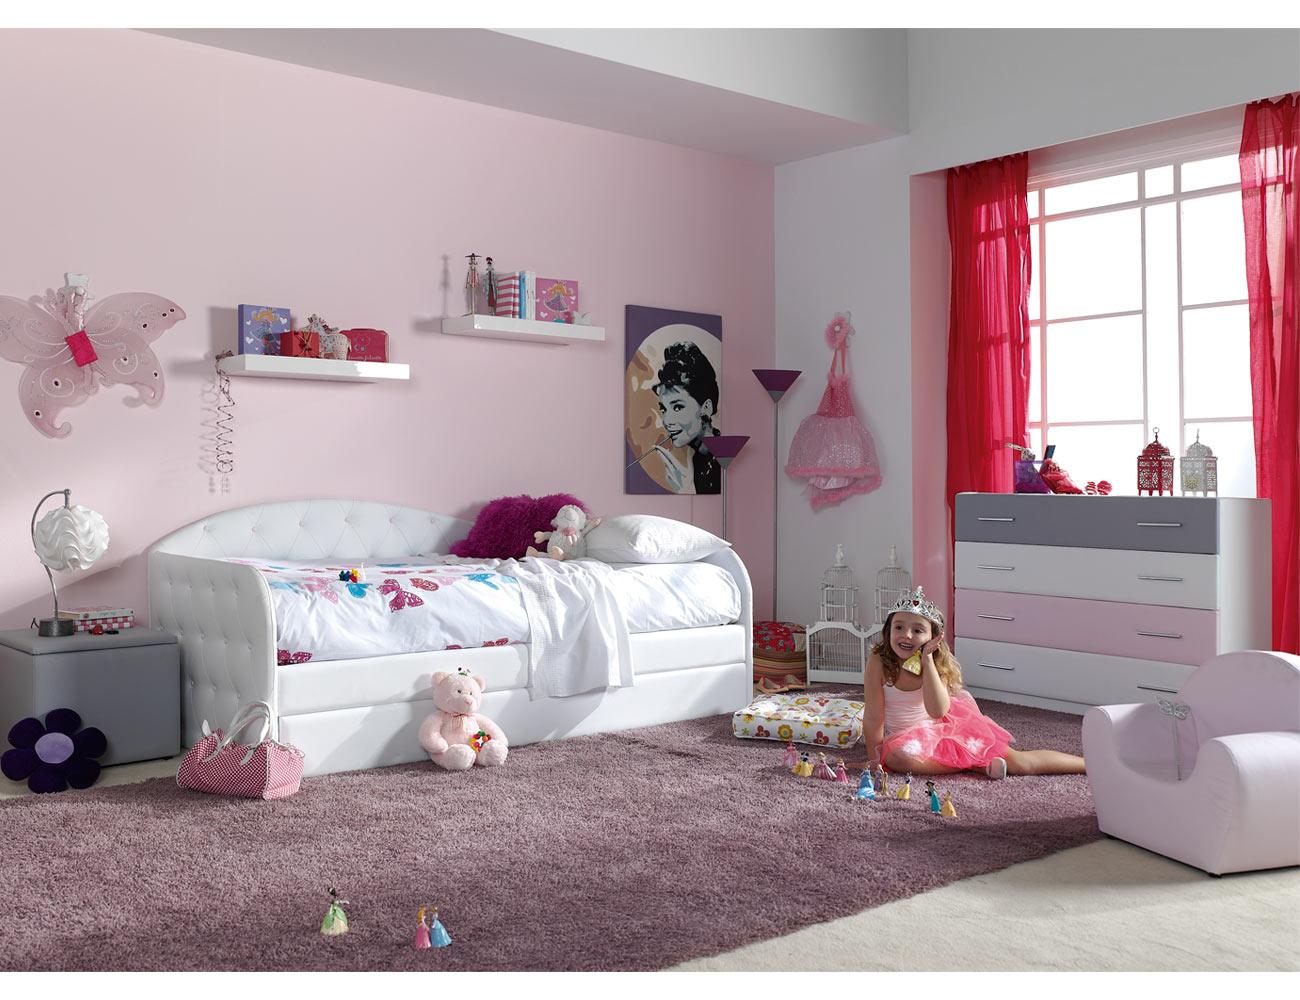 243 cama nido9